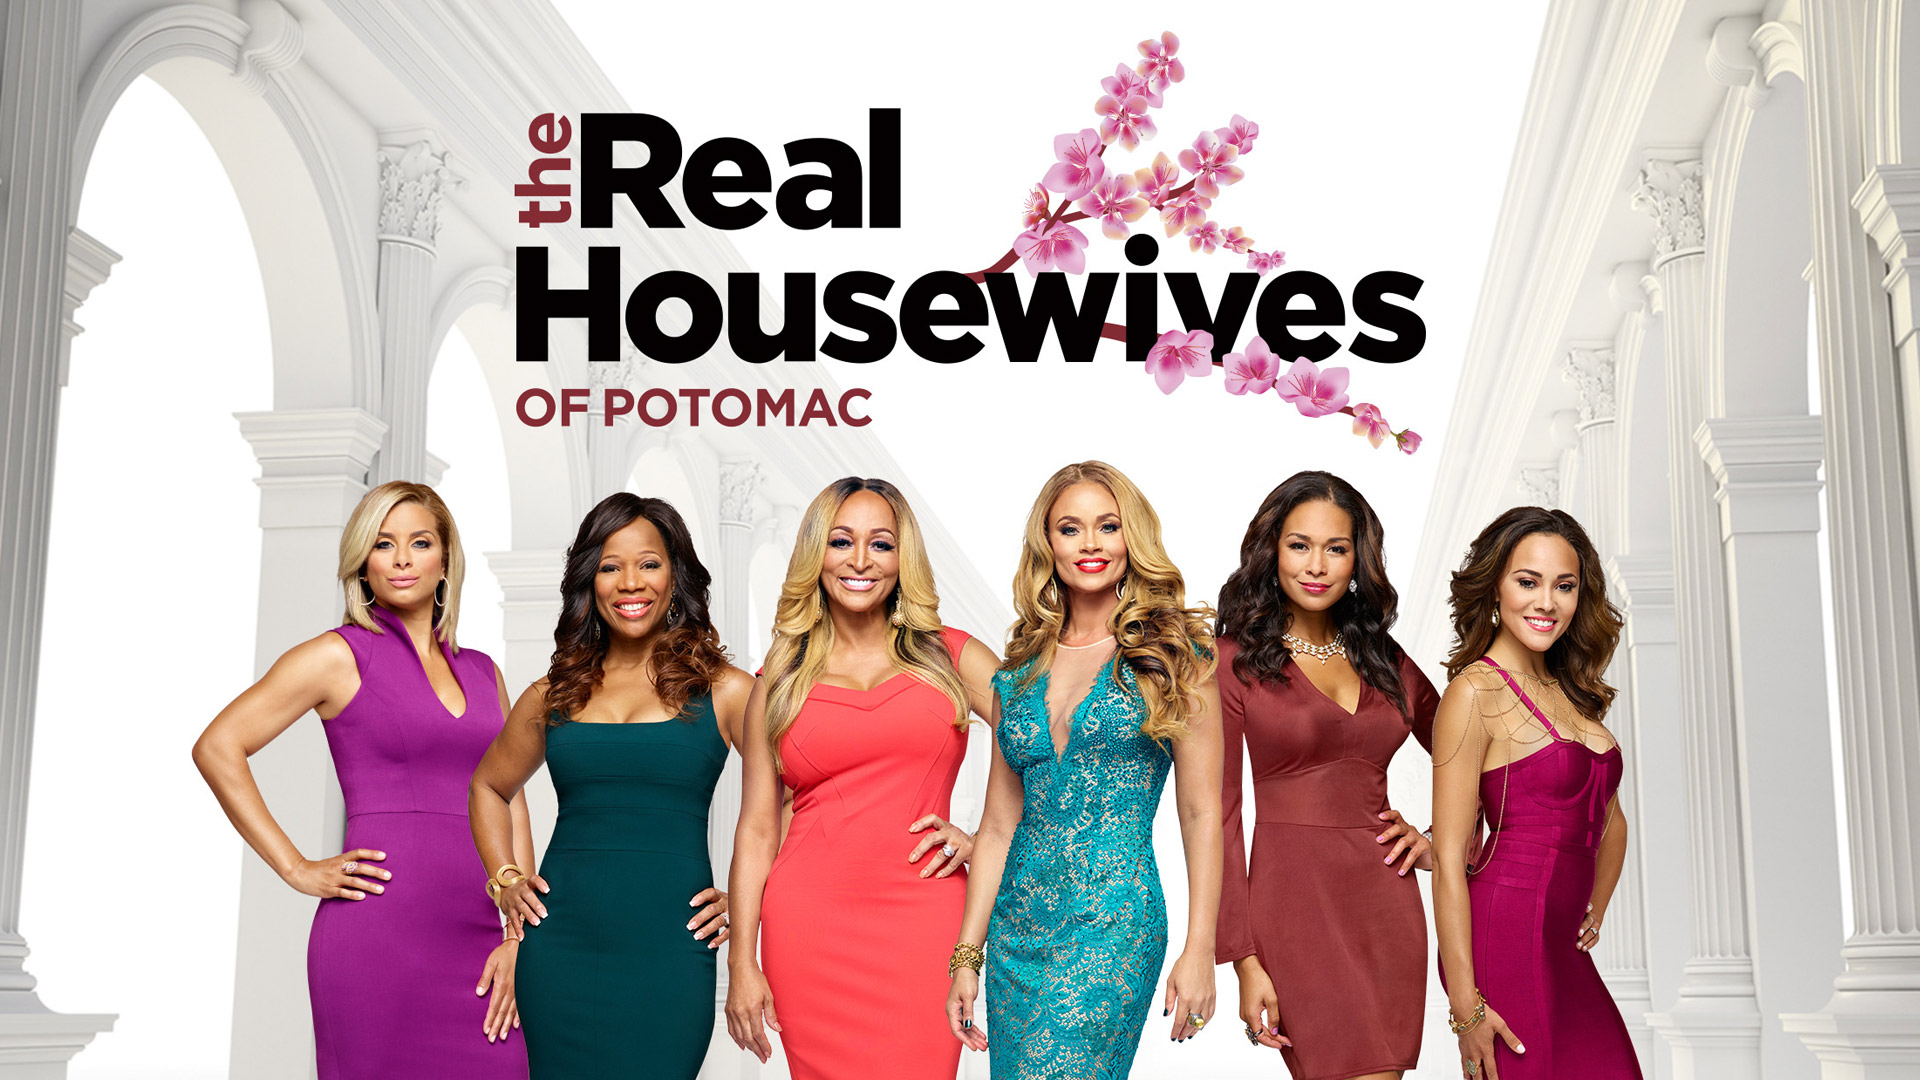 The Real Housewives of Potomac, Season 1